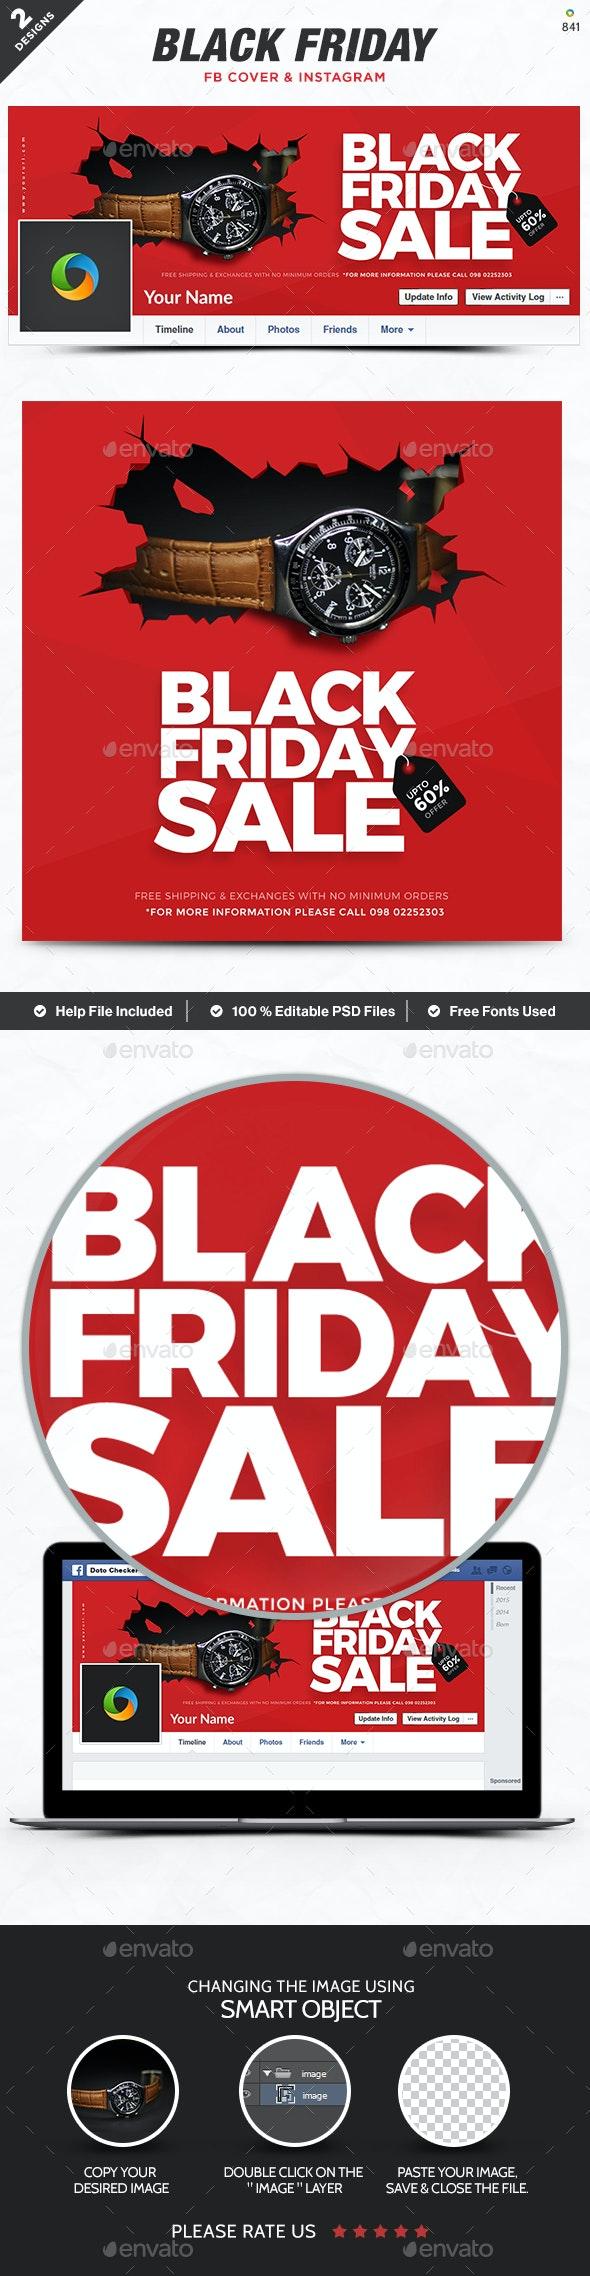 Black Friday  Facebook Cover & Instagram Templates - 2 Designs - Miscellaneous Social Media